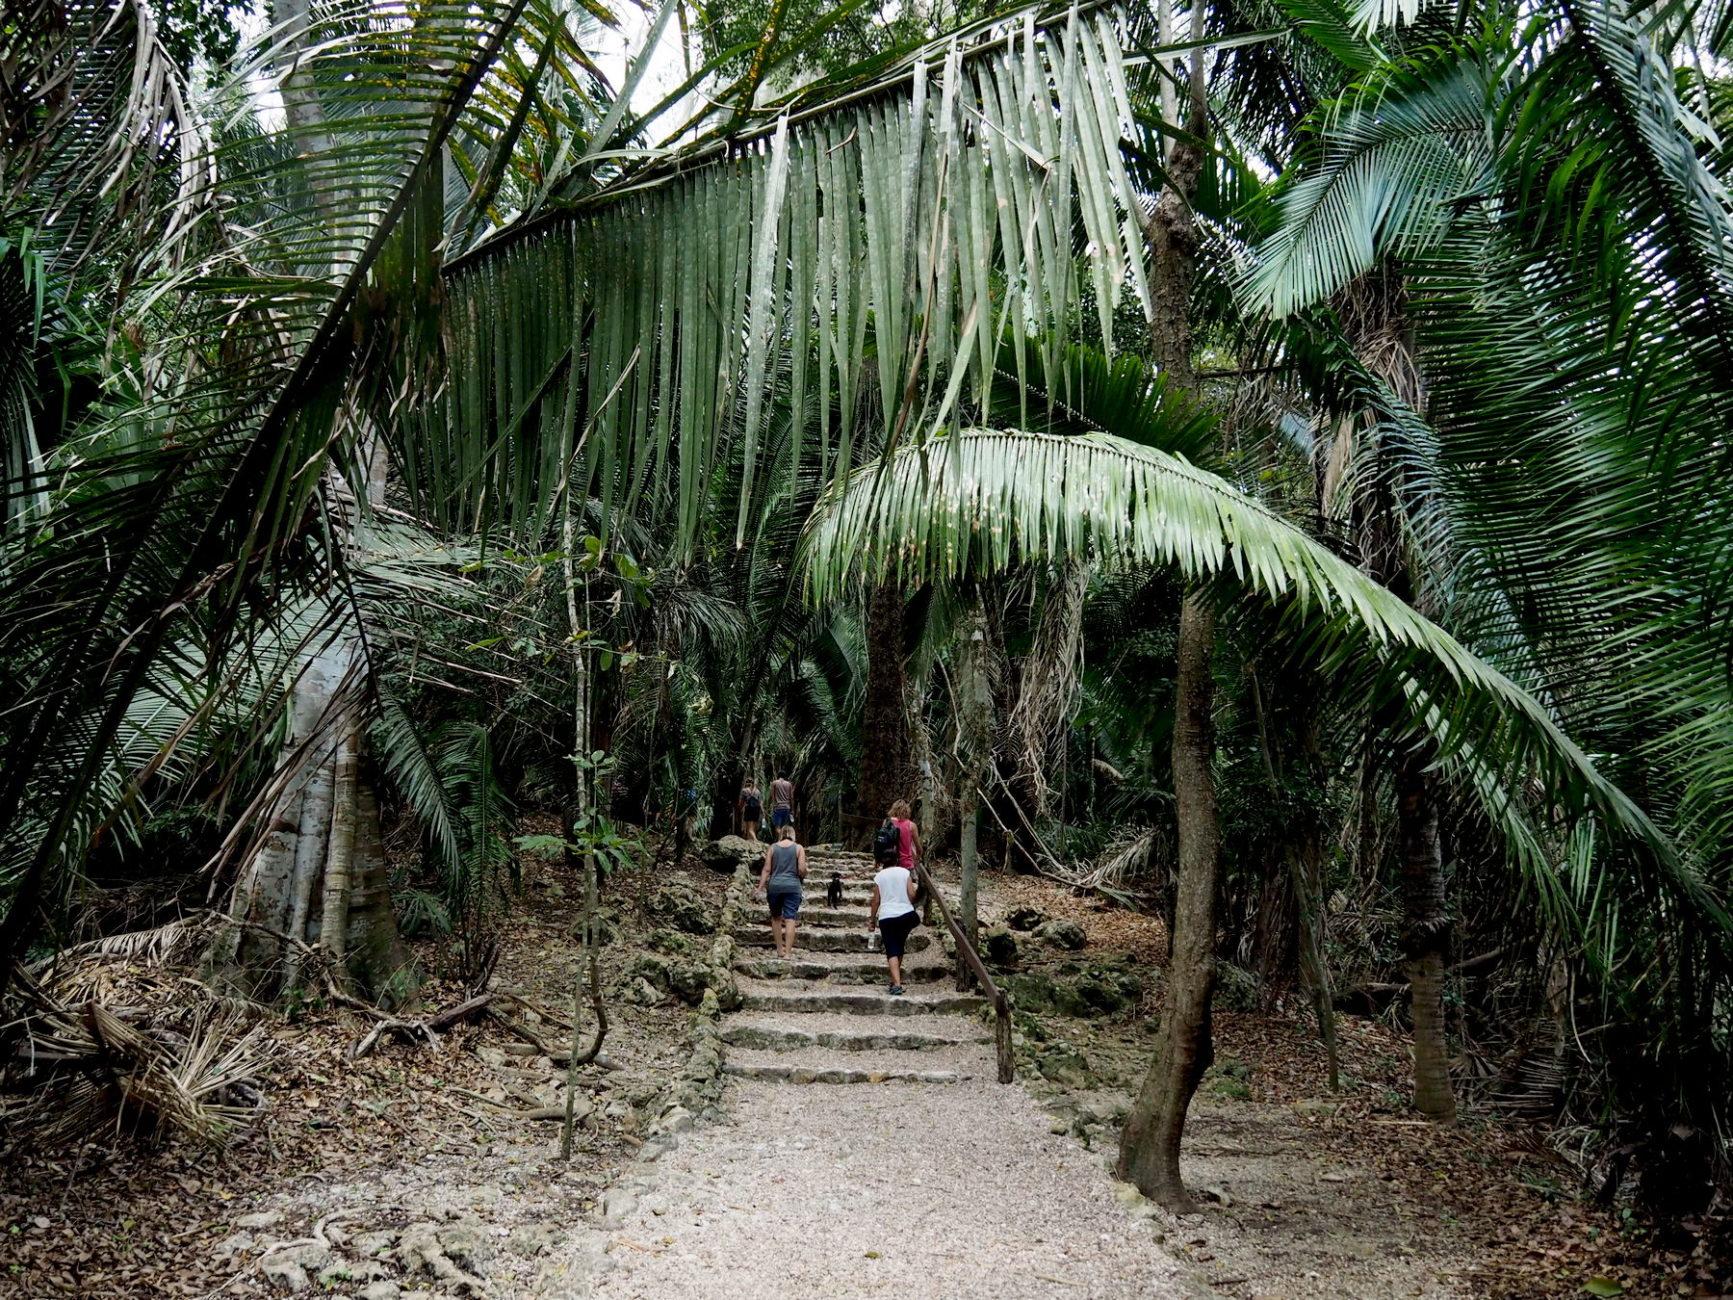 Weg durch üppige Vegetation